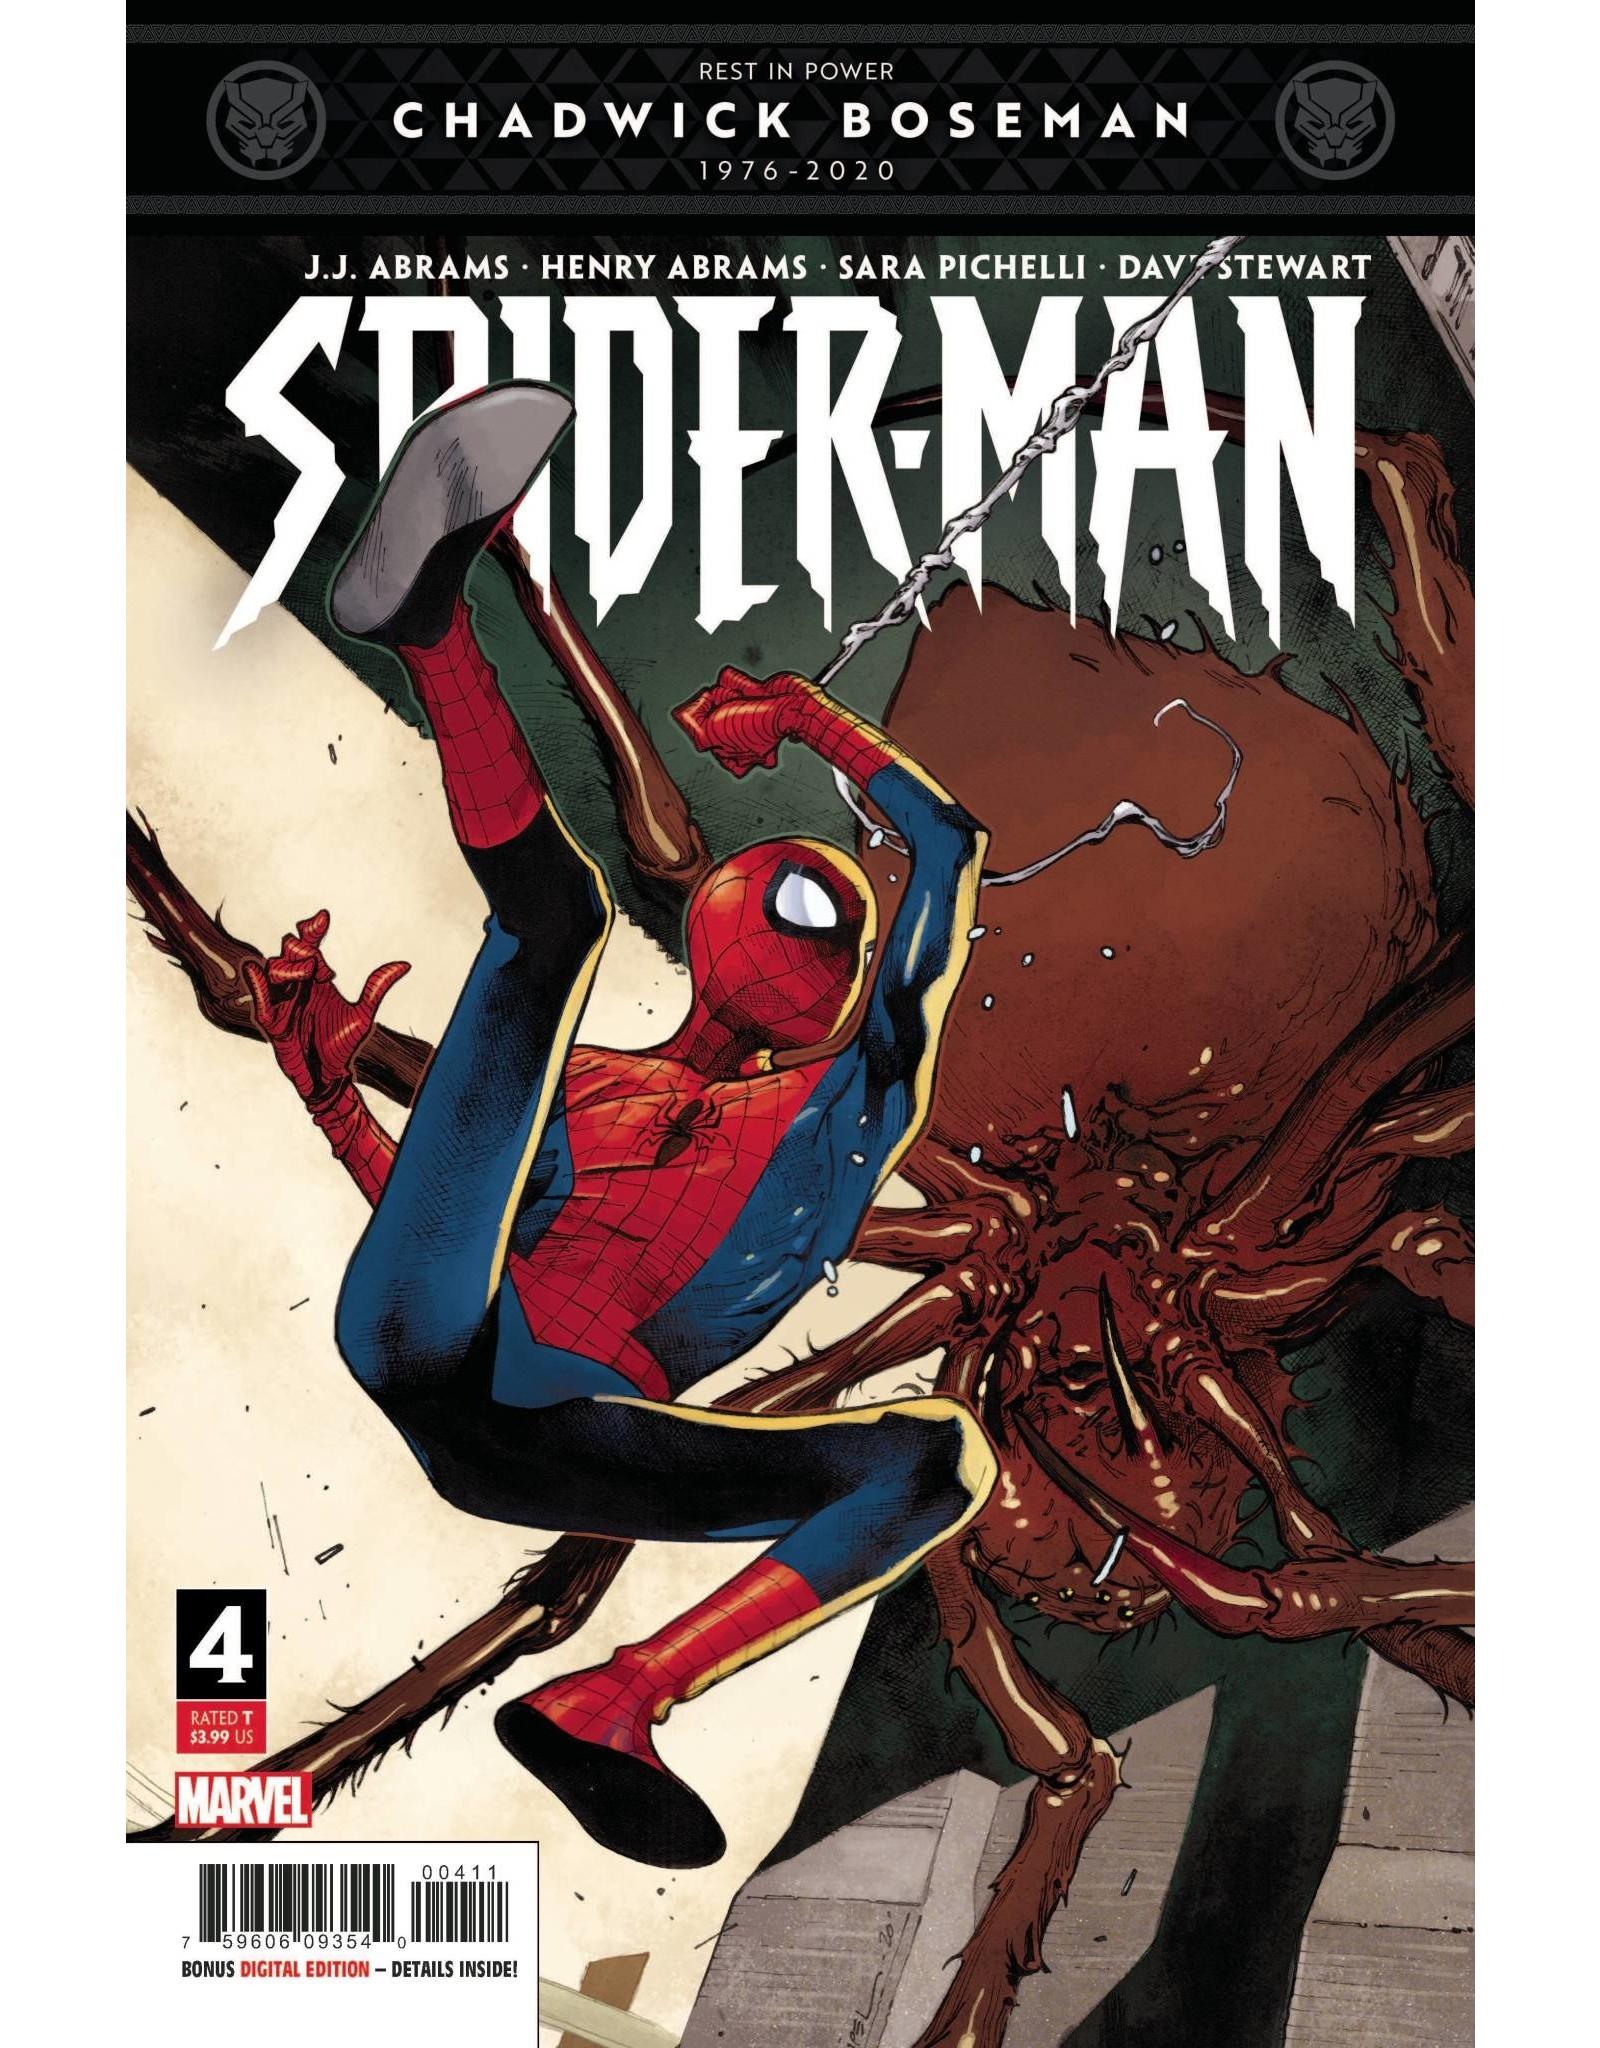 Marvel Comics SPIDER-MAN #4 (OF 5)